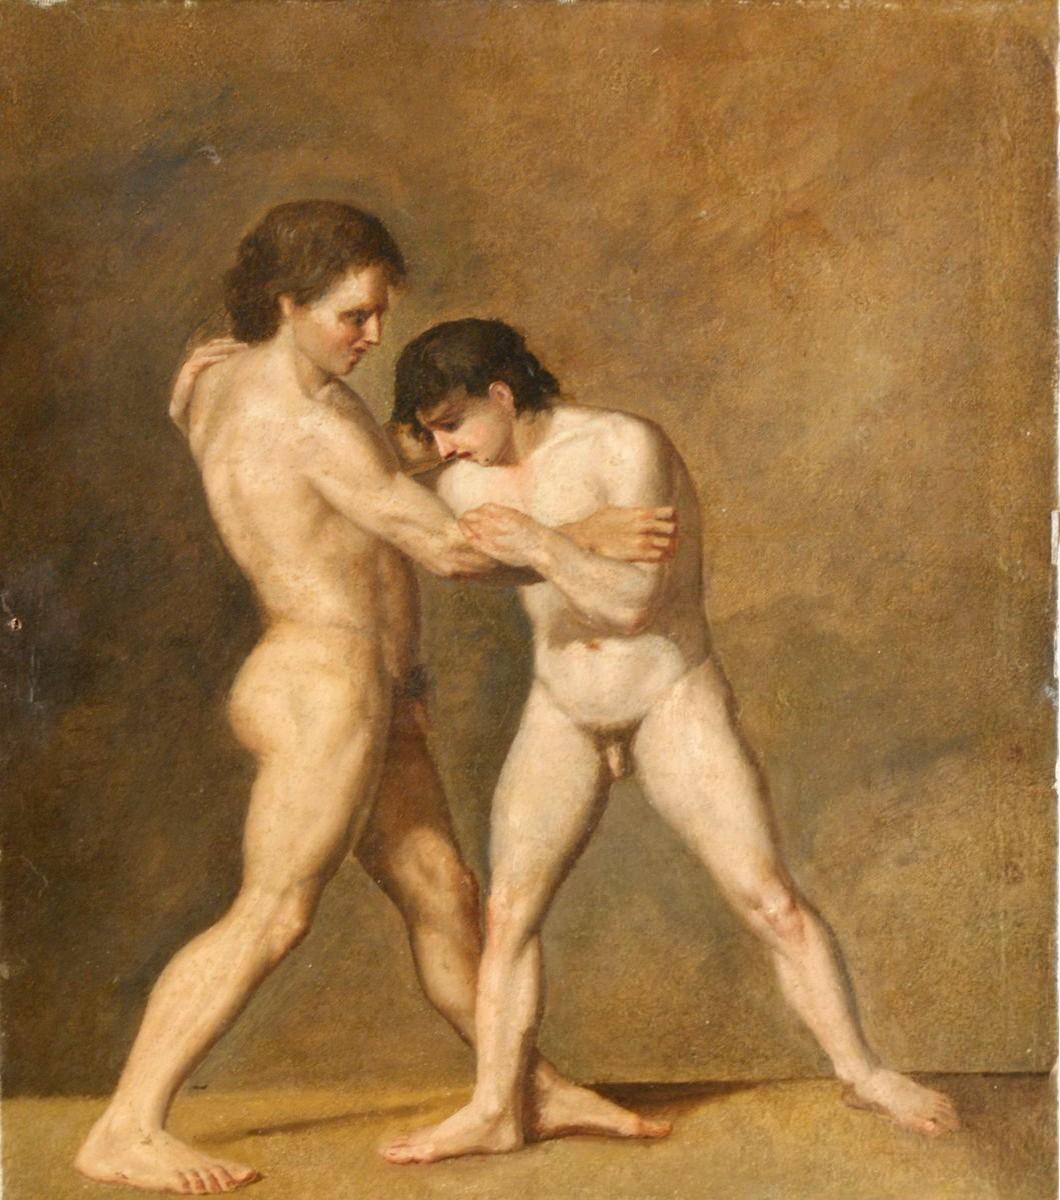 19th Century Italian School: Male Nude Wrestlers